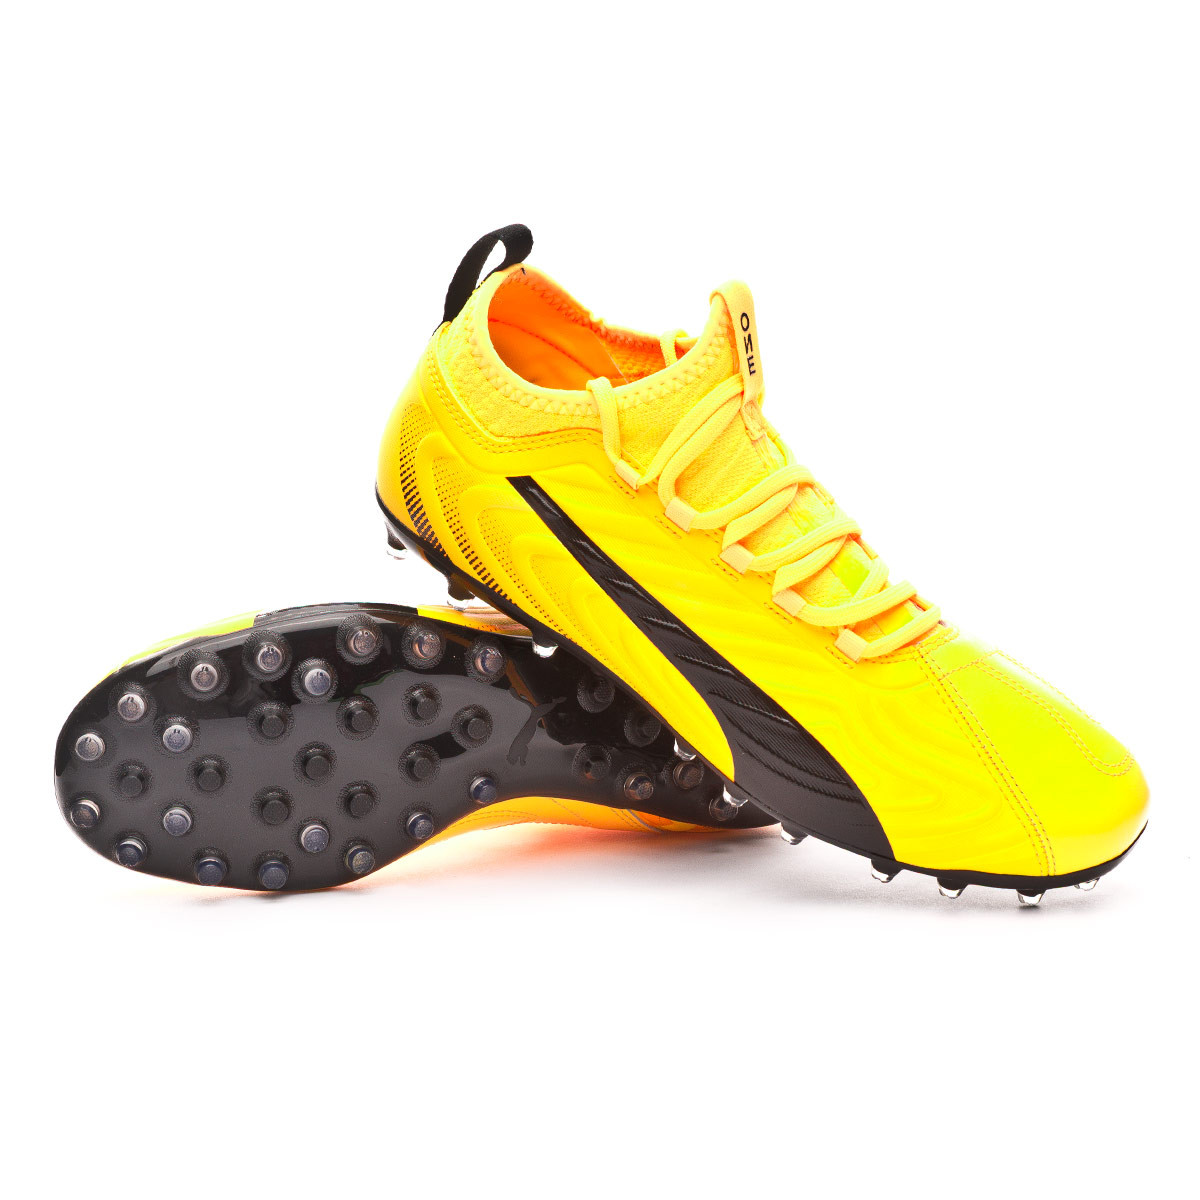 Puma One 20.3 MG Football Boots